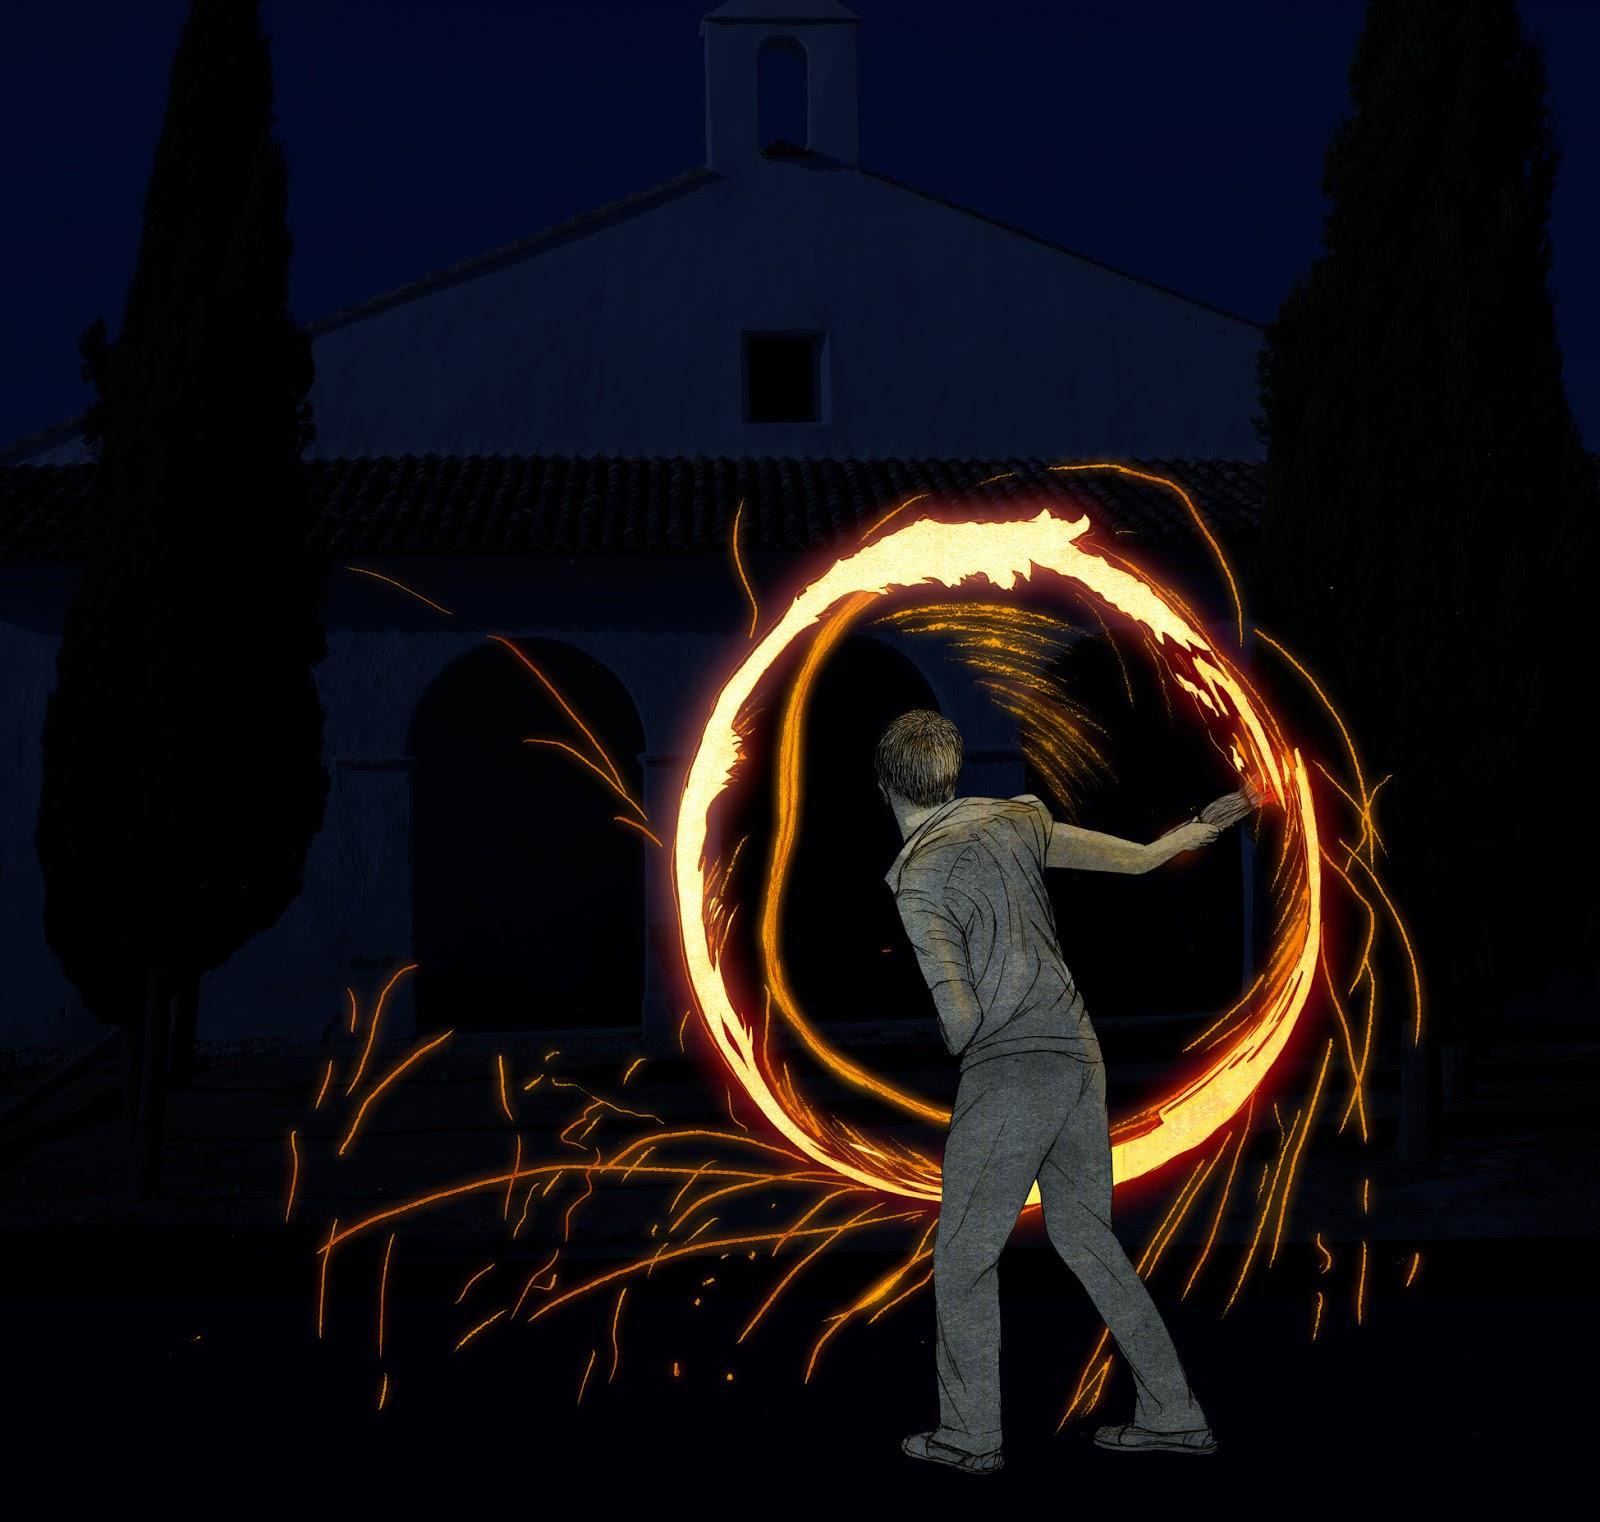 Peste, fuego, celebracion, acrobacia, dibujo